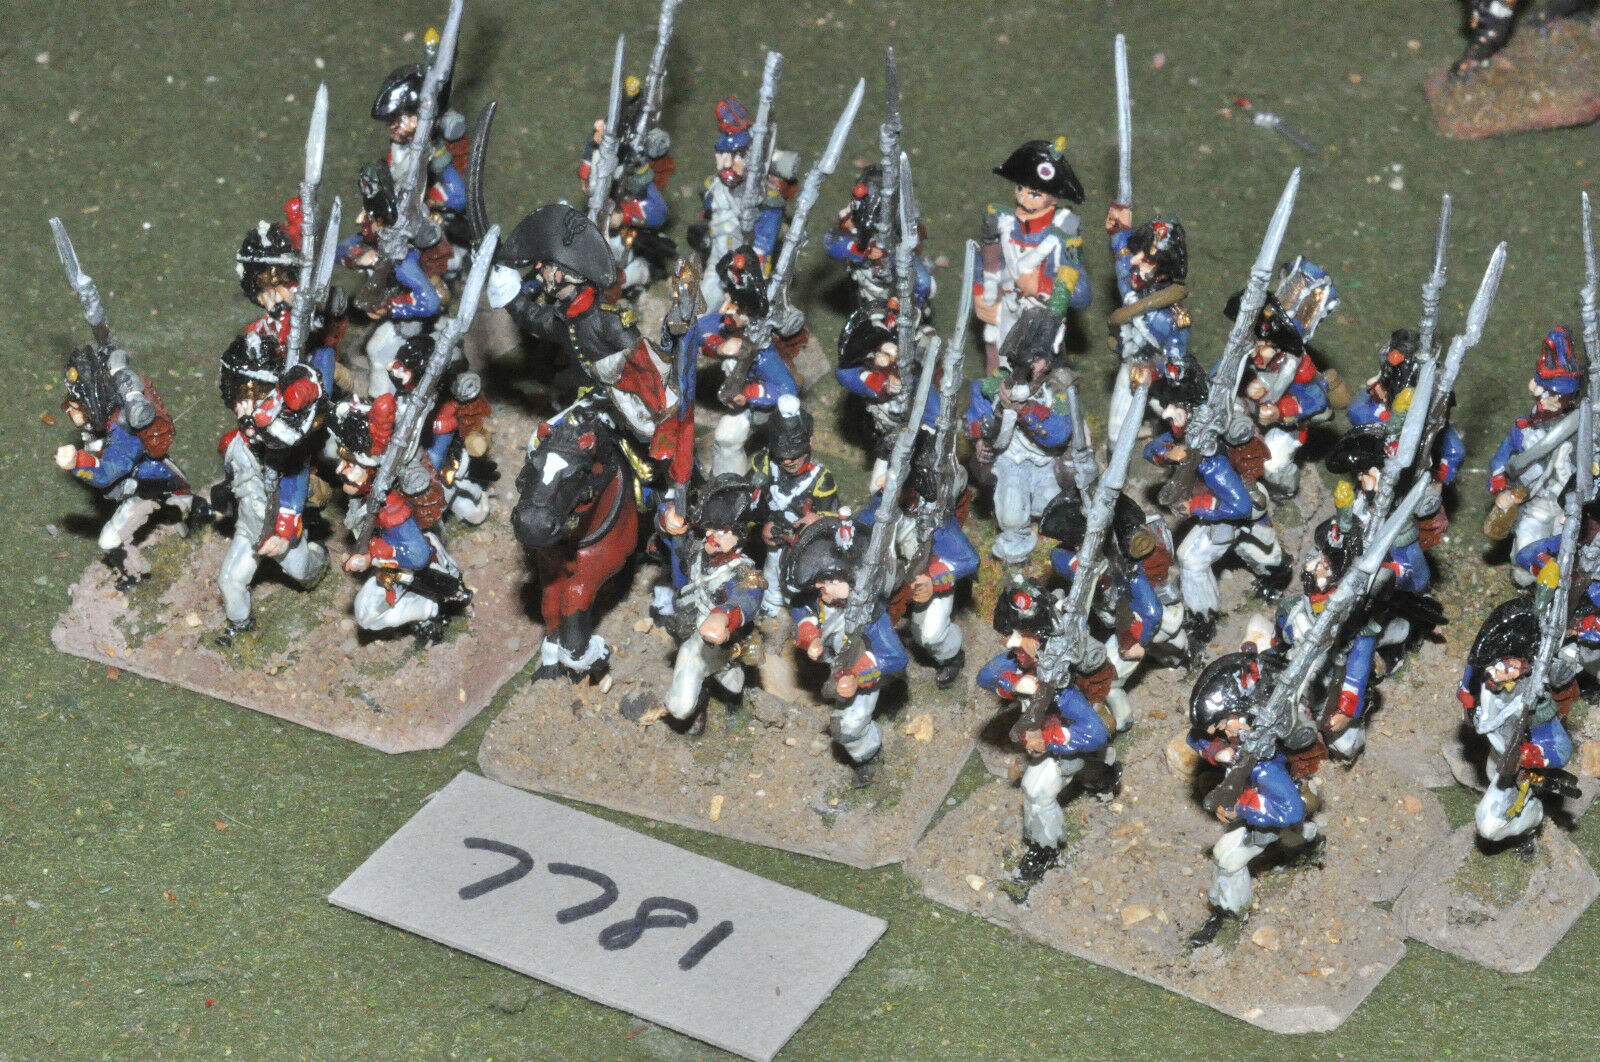 25mm napoleónicas Francés-Guerra Revolucionaria infantería 32 higos Metal-INF (7781)